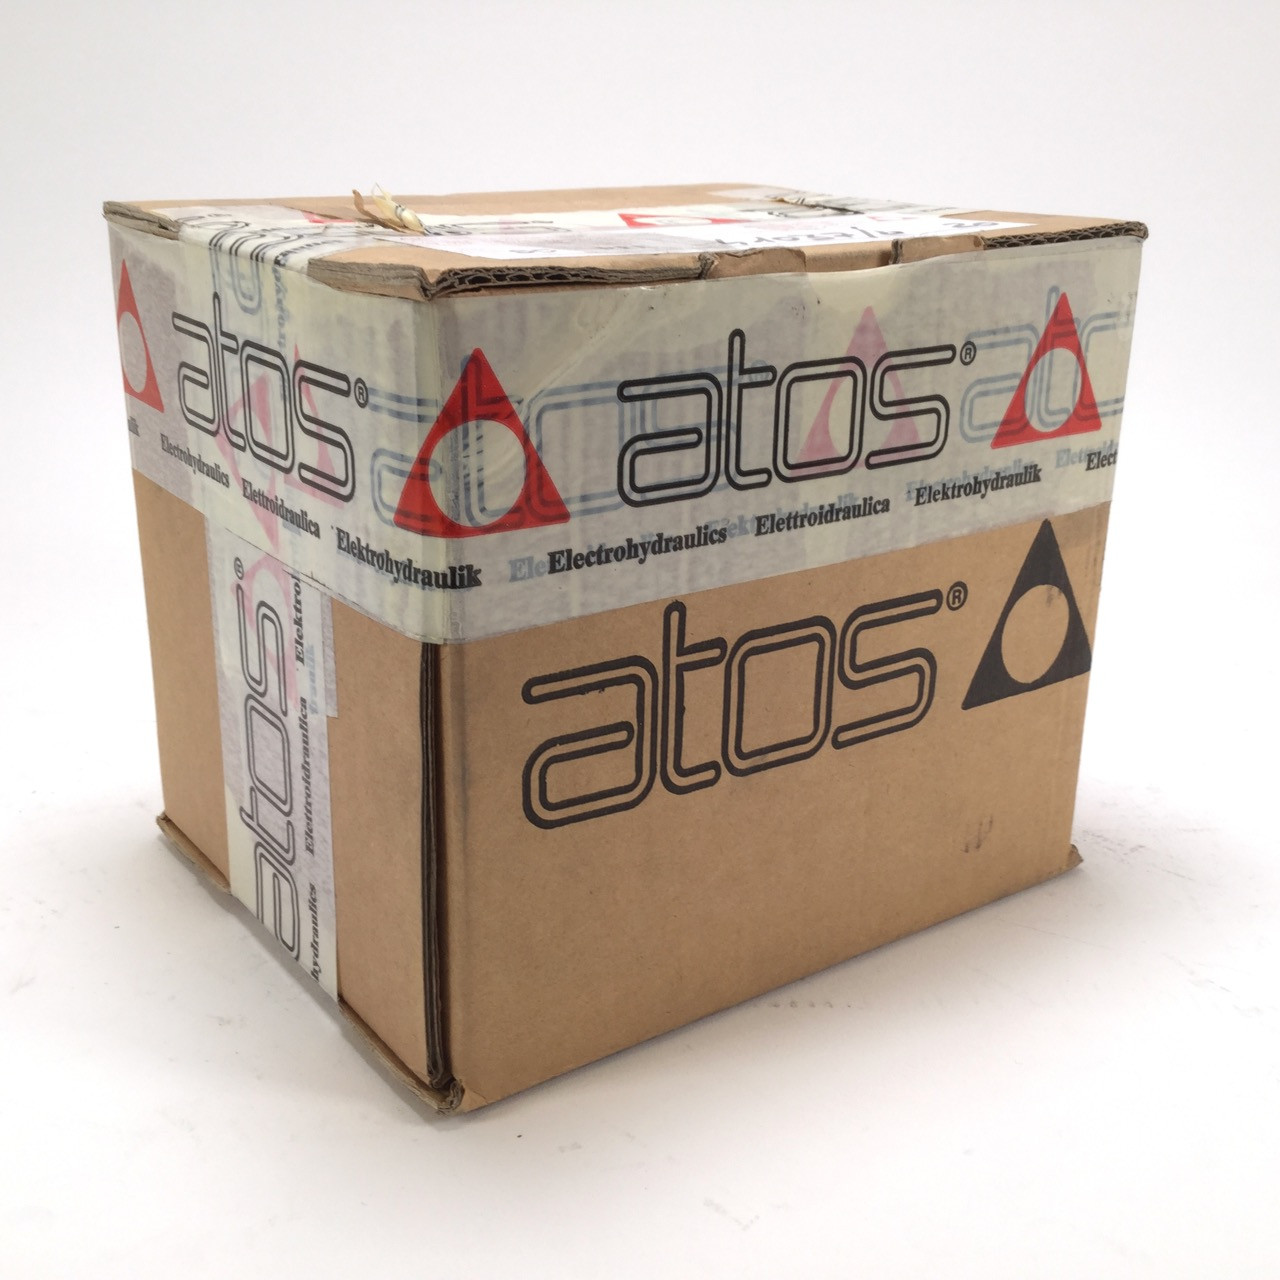 کارتریج آتوس ATOS CARTRIDGE